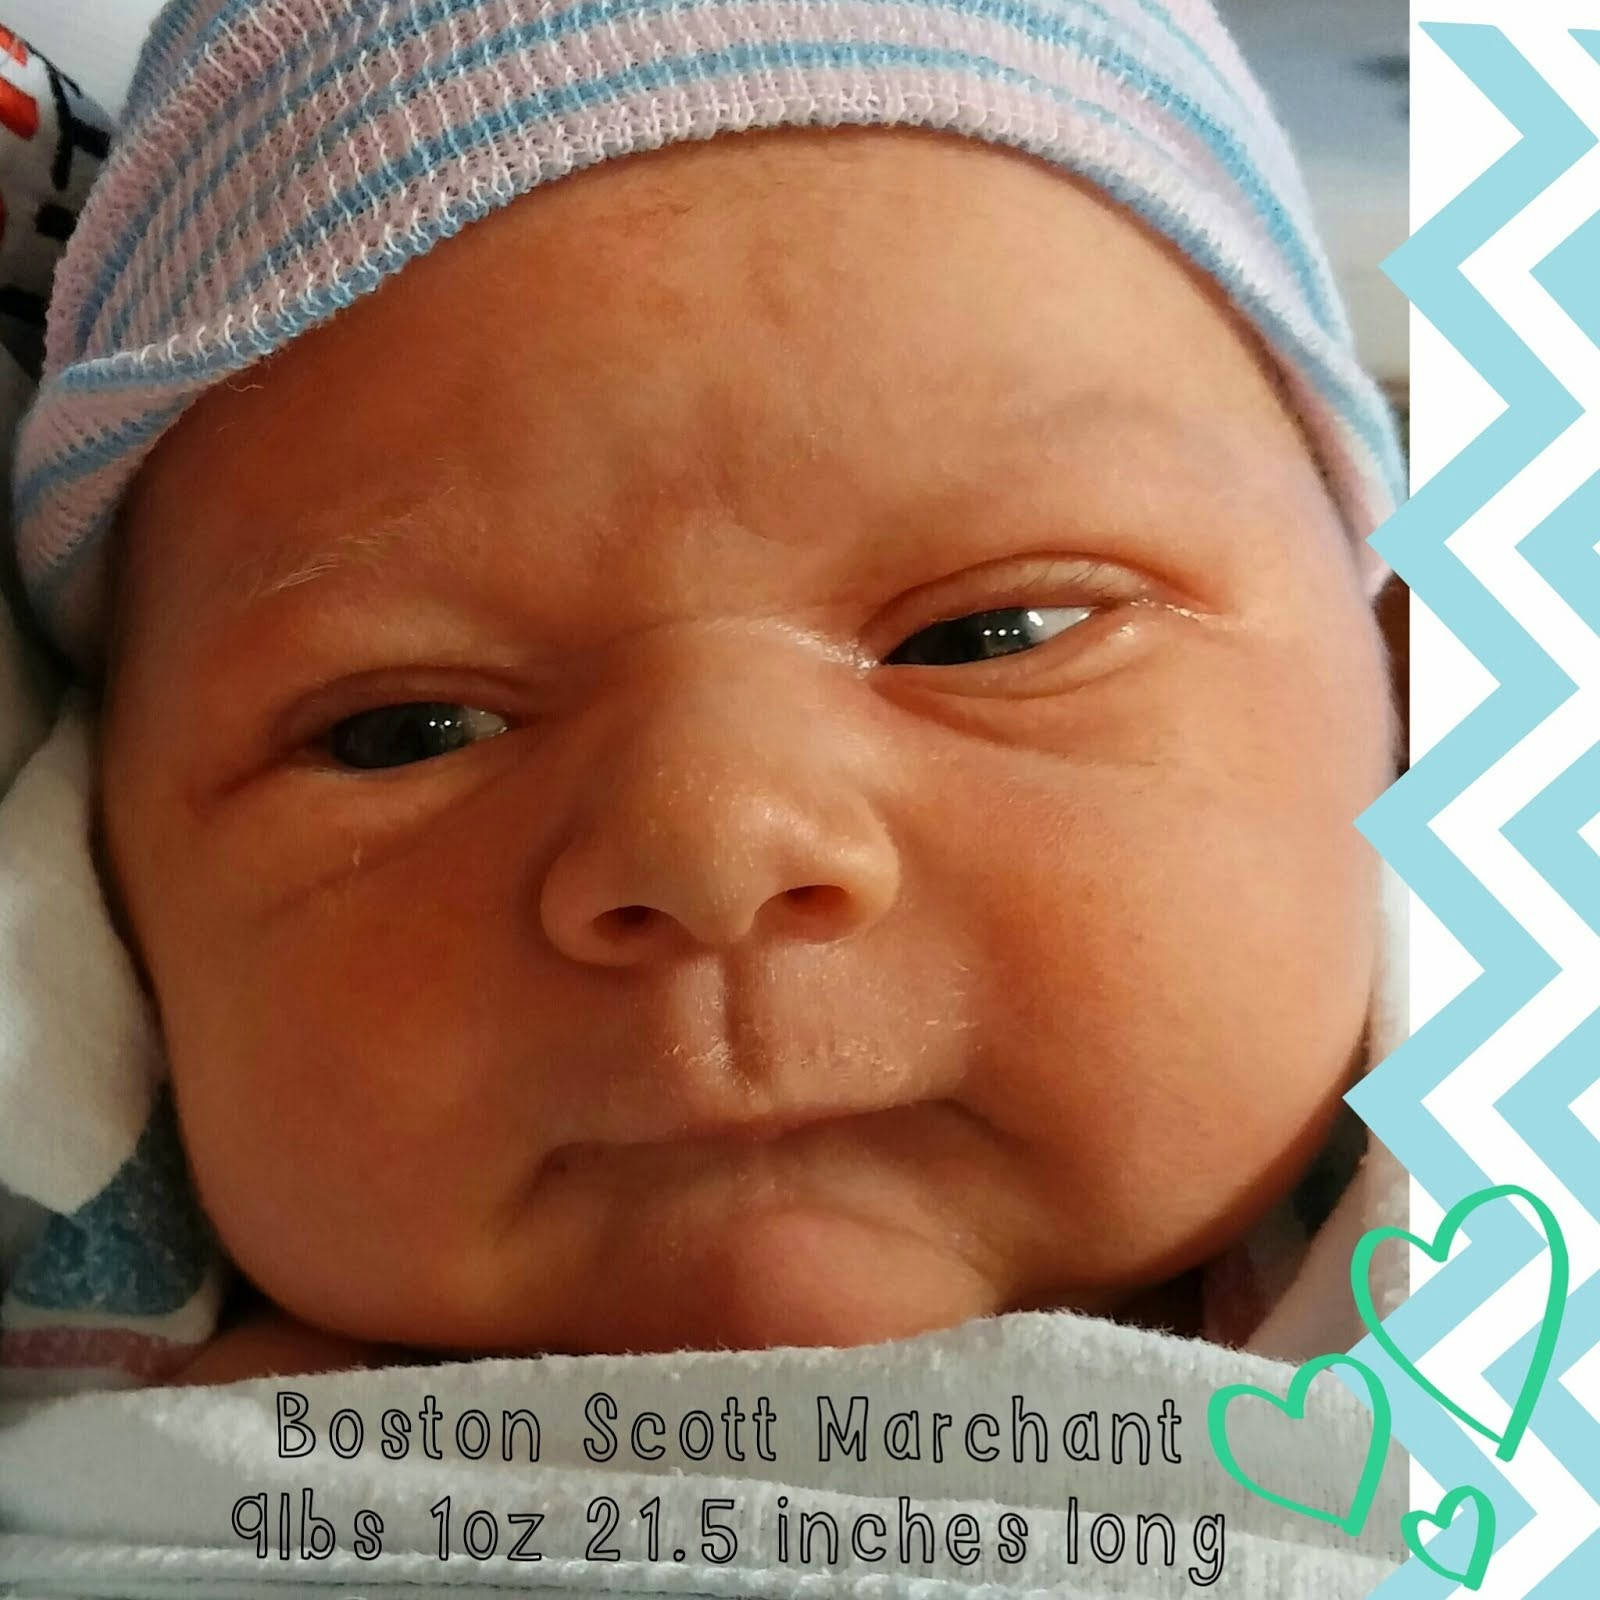 Boston Scott Marchant